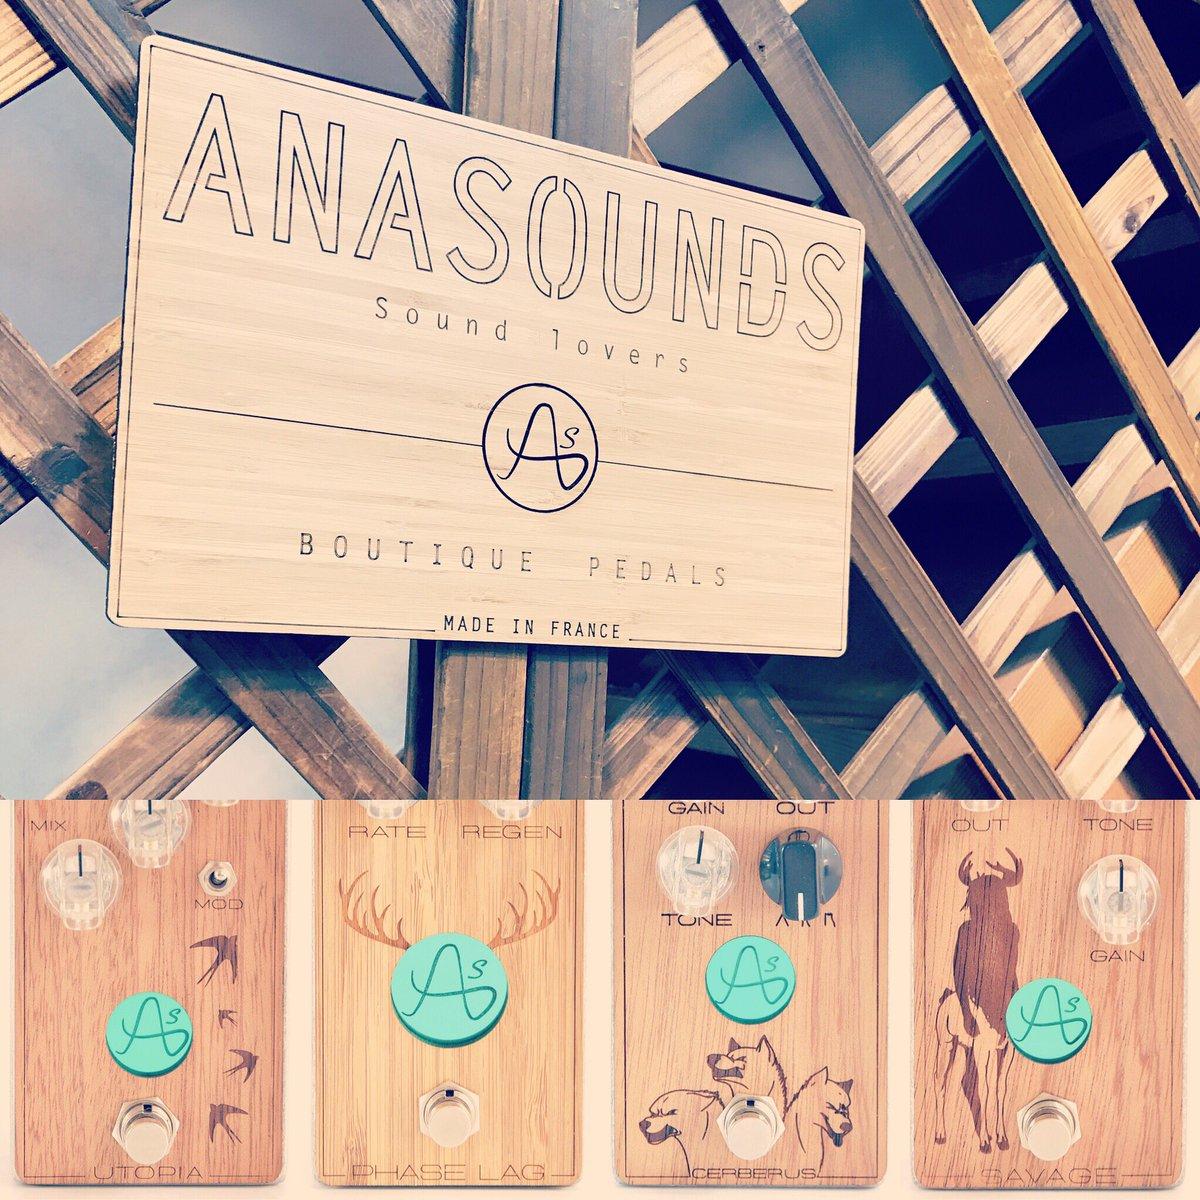 ANASOUNS エフェクター取扱展示購入店として、ブランドパネルを展示しましたー! #anasounds #utopi